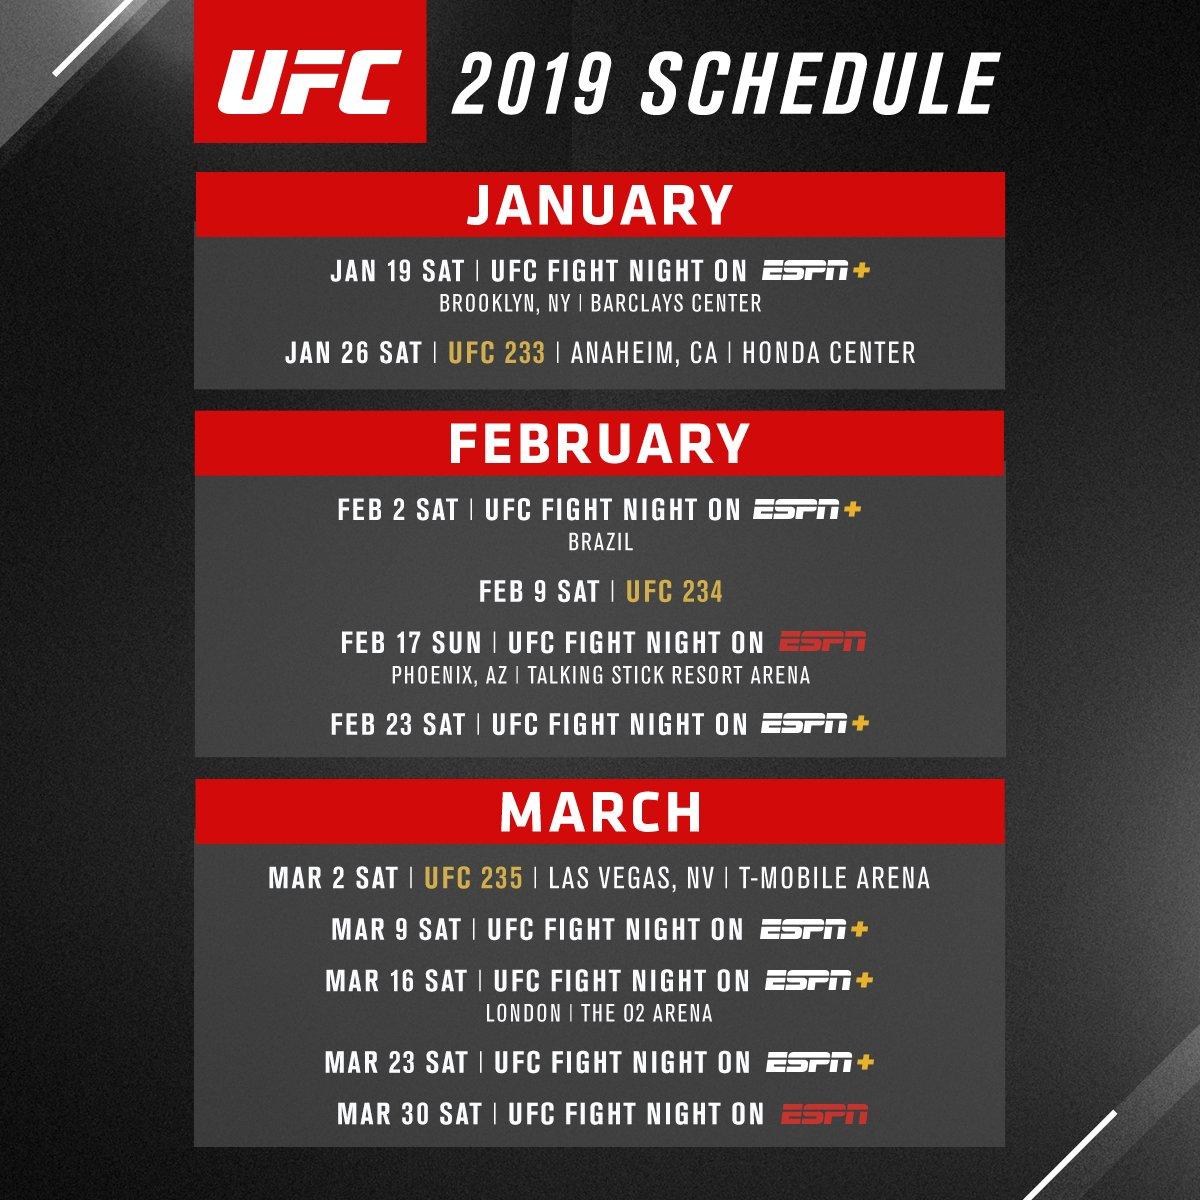 The new era begins Jan. 19.   @ESPN, you ready?! https://t.co/joKTwLvO6Z